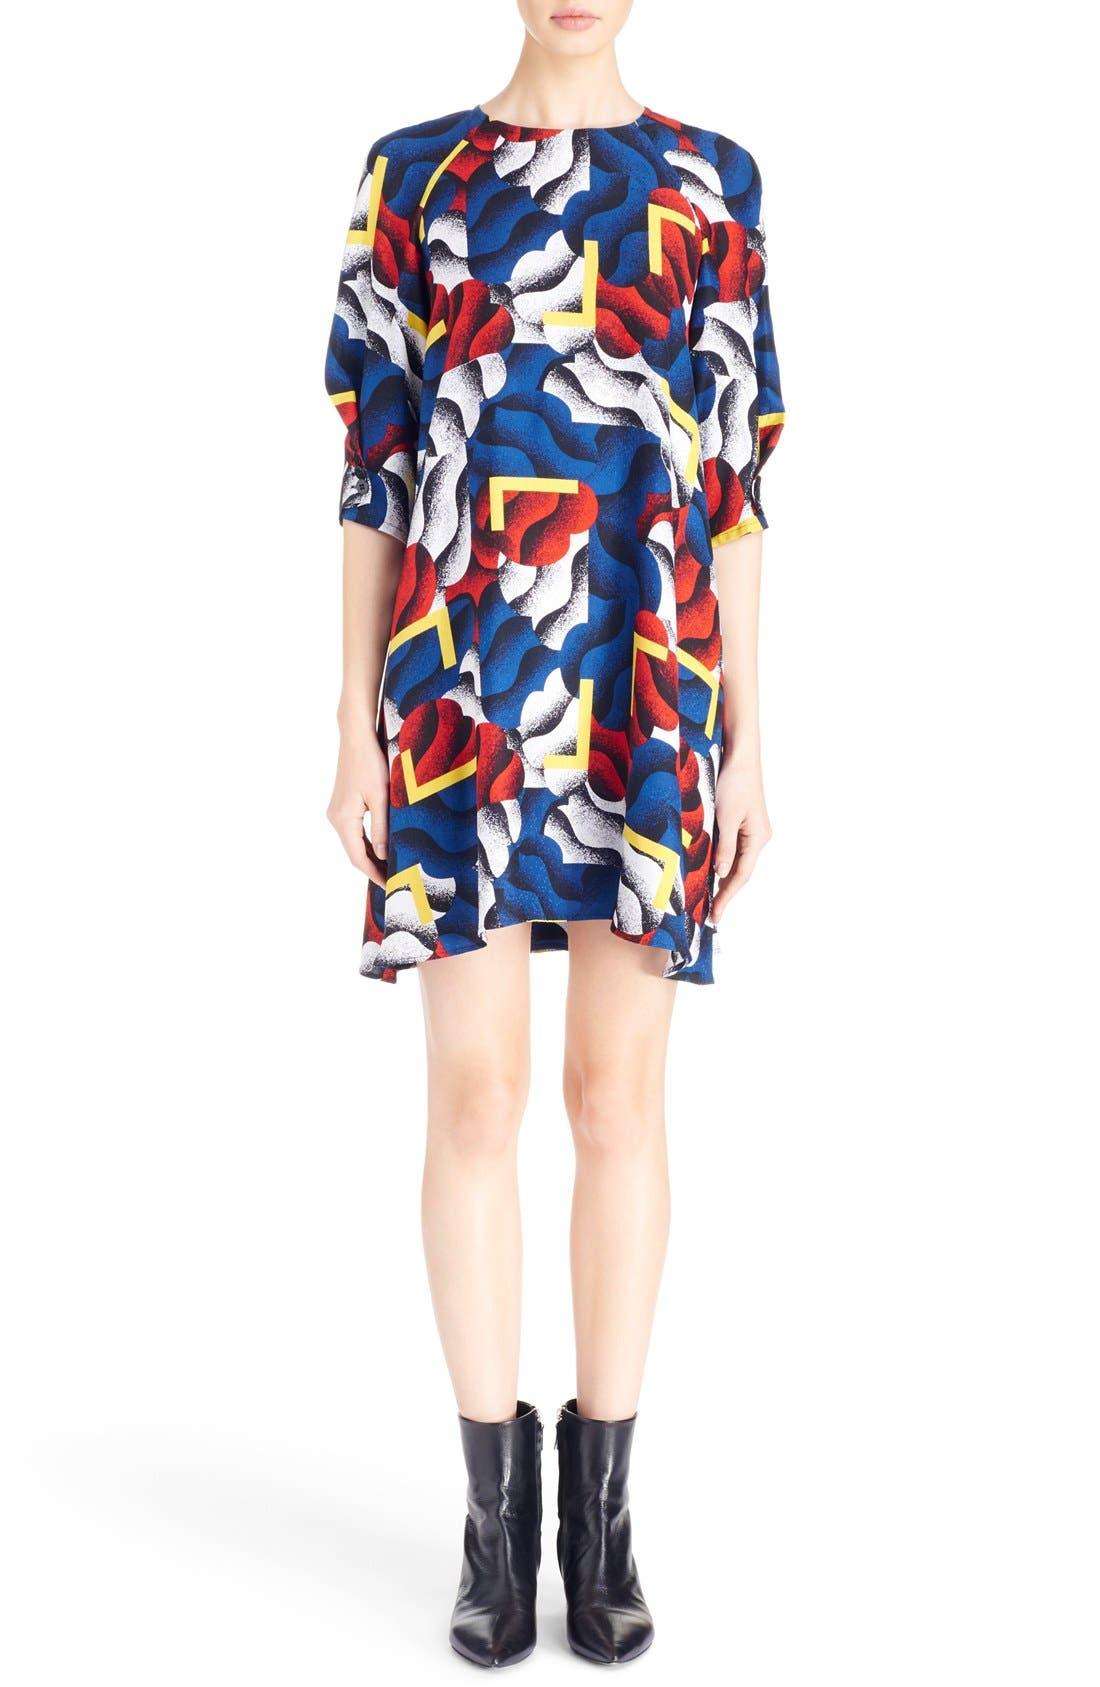 Alternate Image 1 Selected - KENZO 'Clouds & Corners' Print Silk Dress